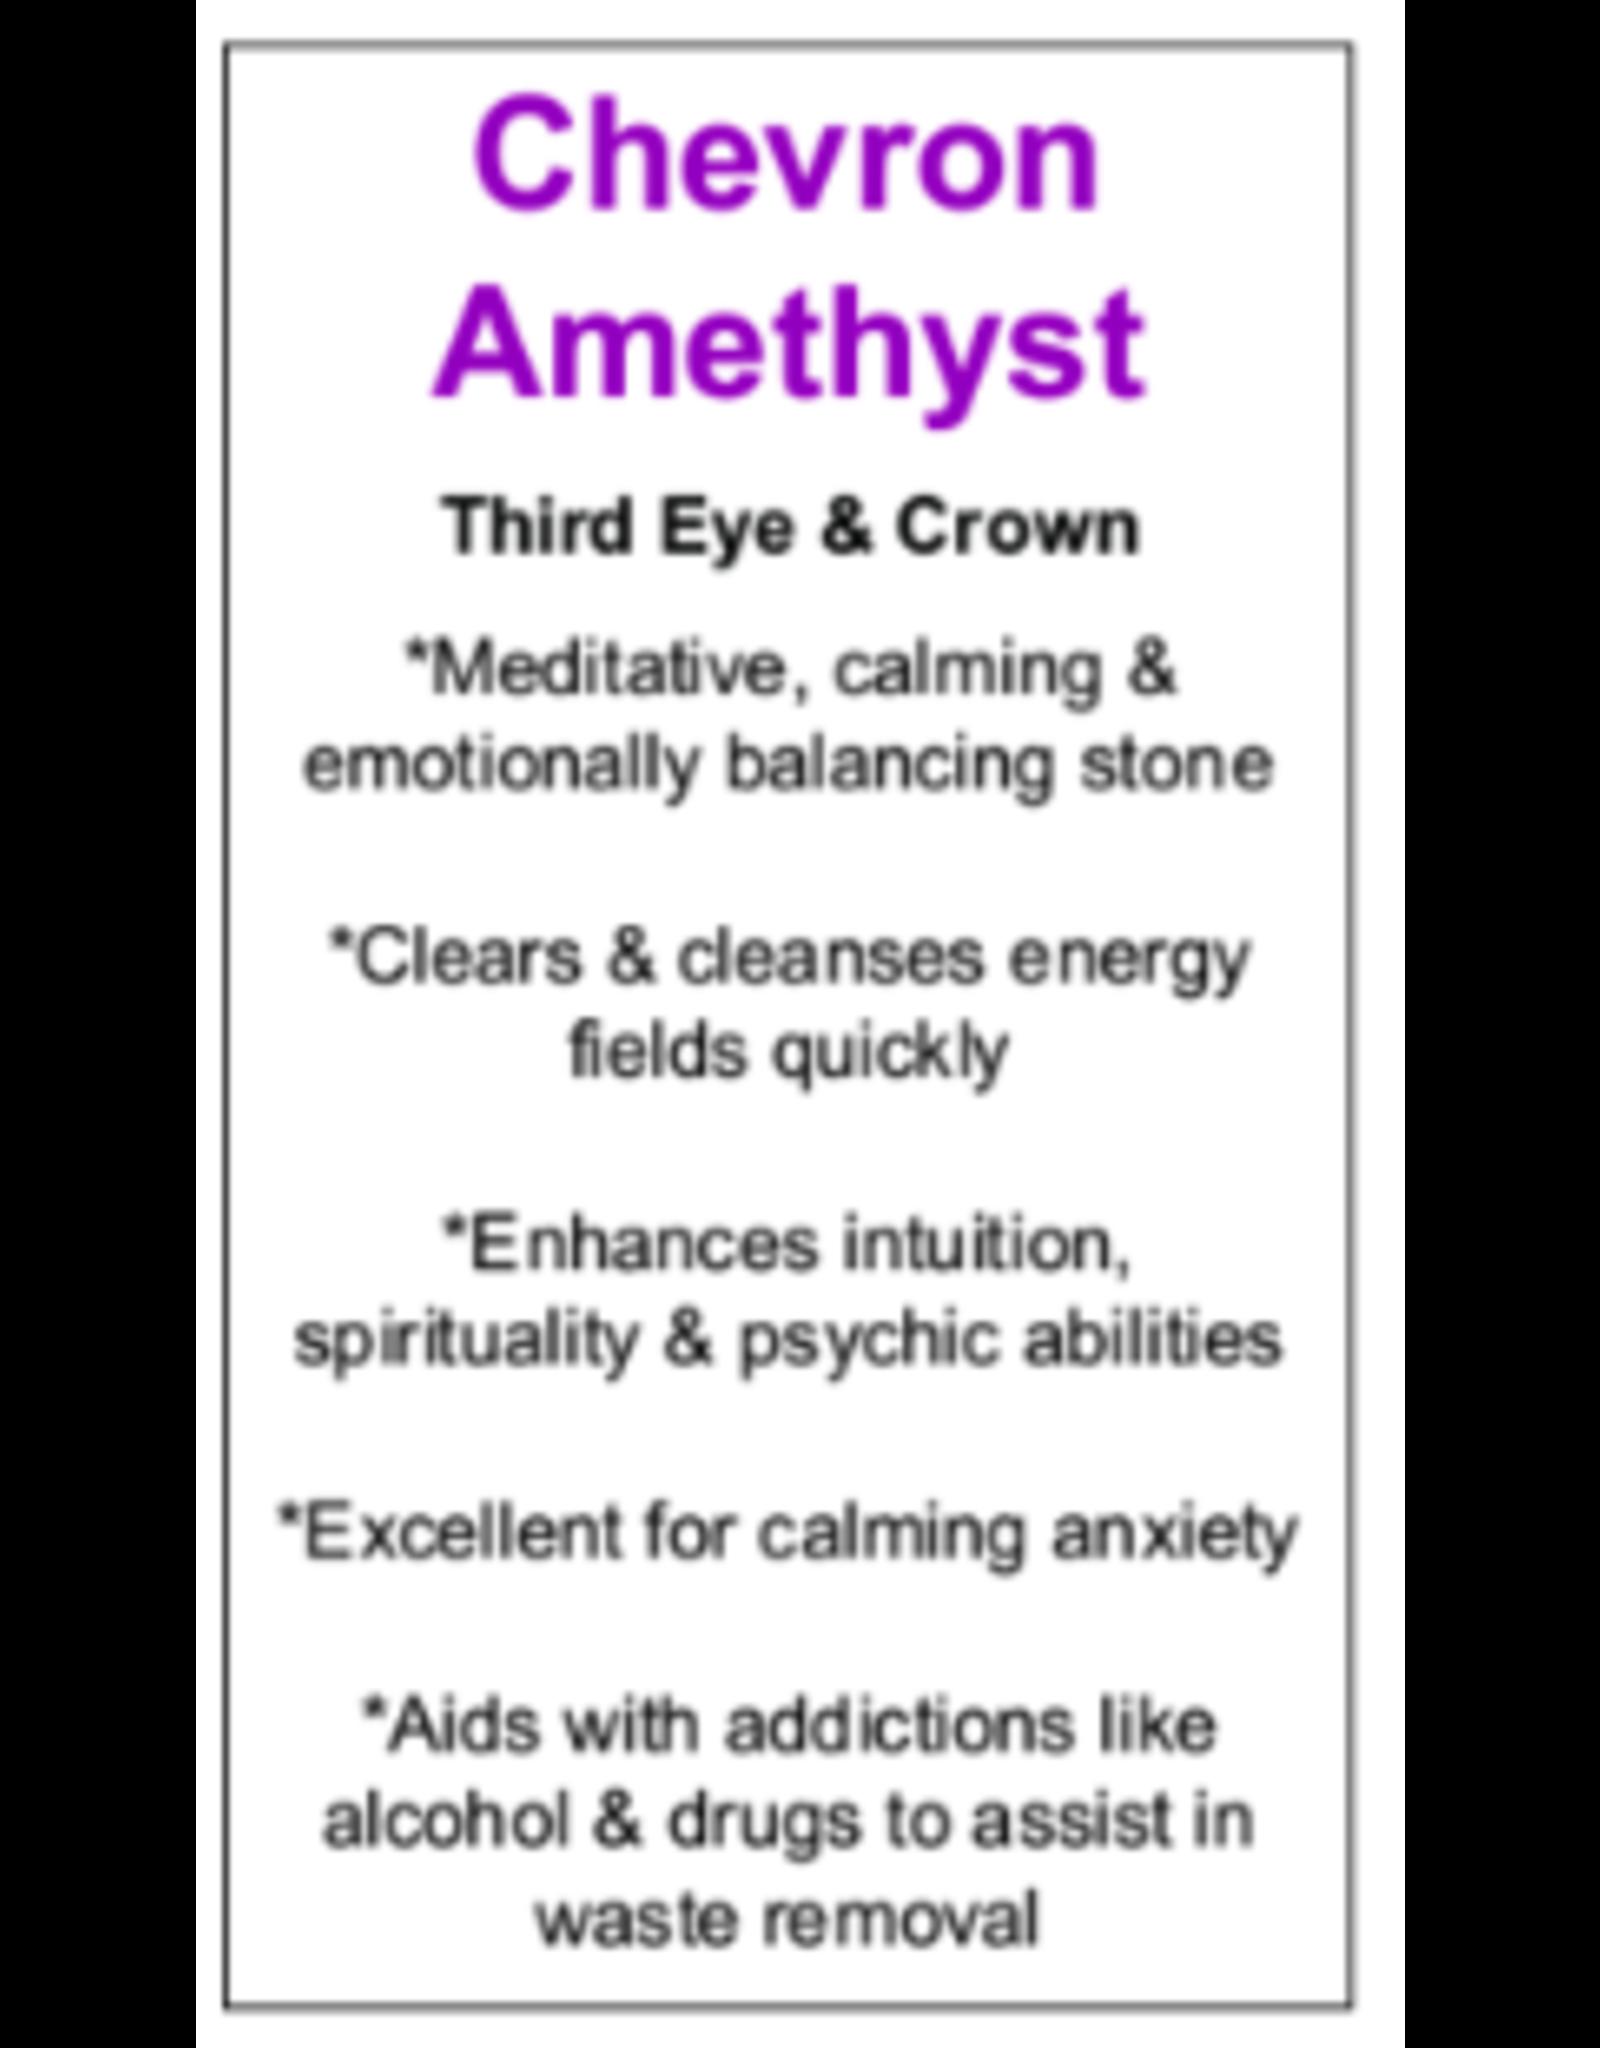 Chevron Amethyst Ring (Teardrop) - Size 8